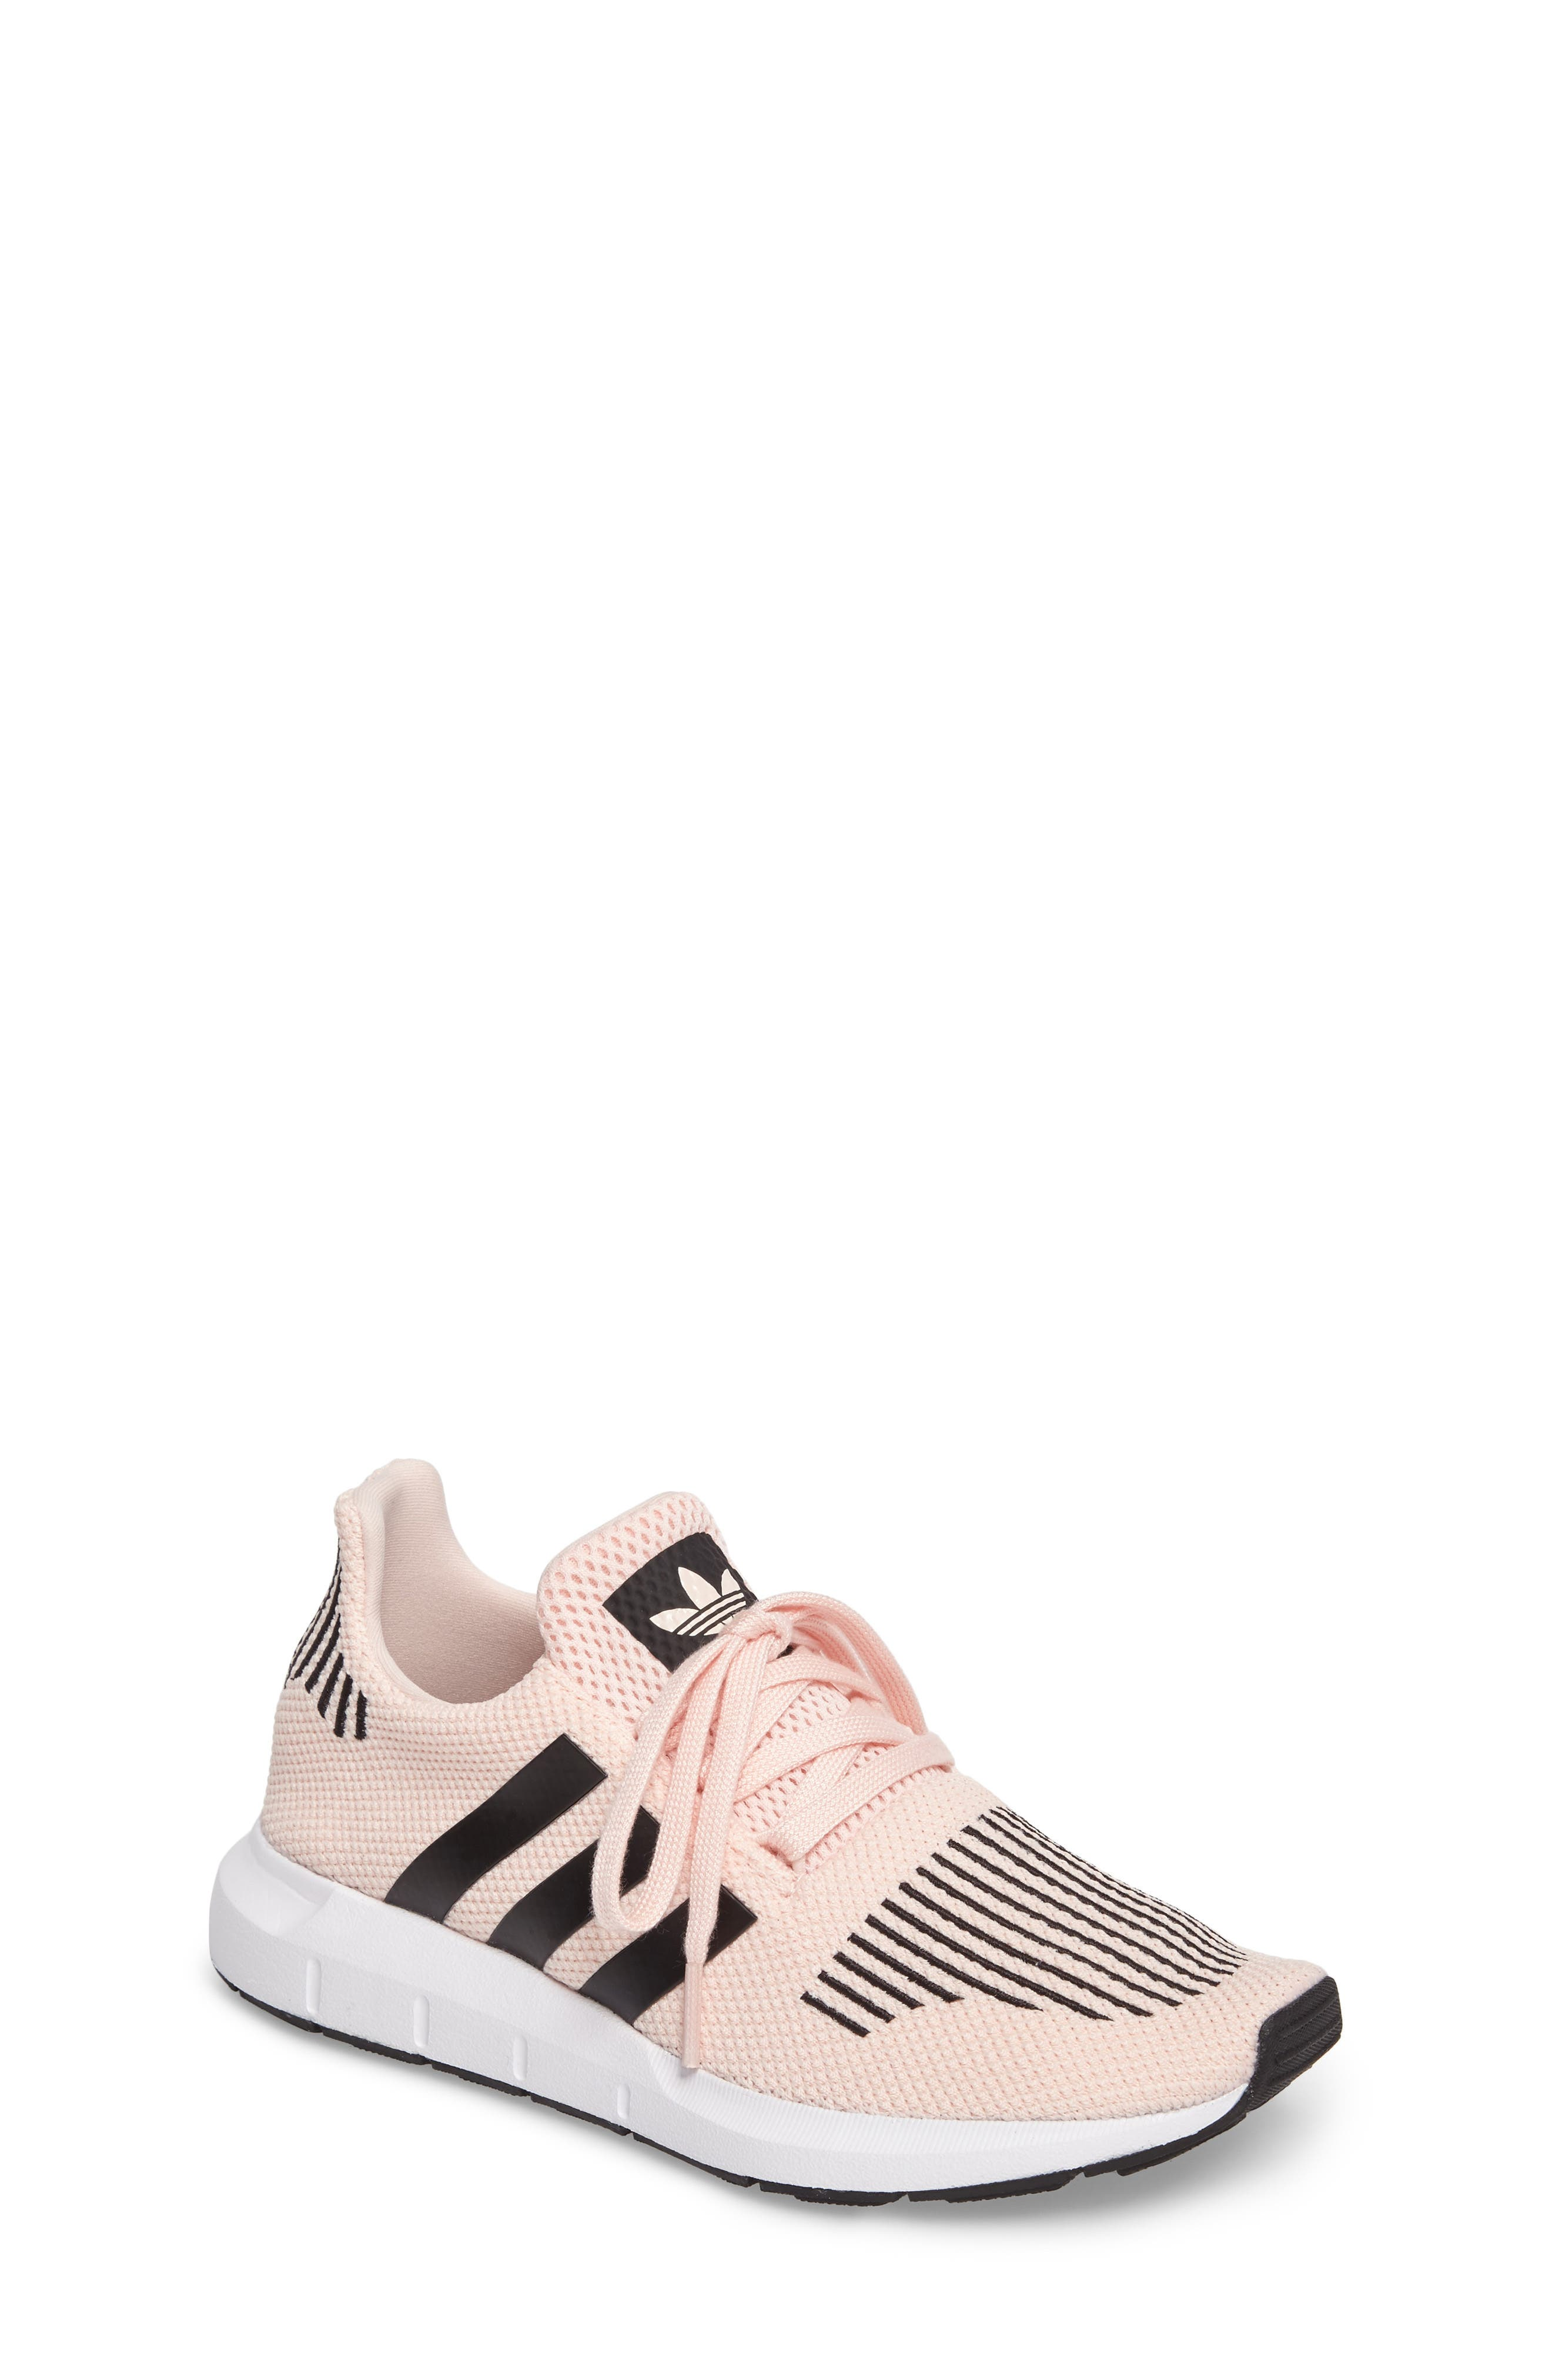 adidas Swift Run J Sneaker (Baby, Walker, Toddler, Little Kid \u0026 Big